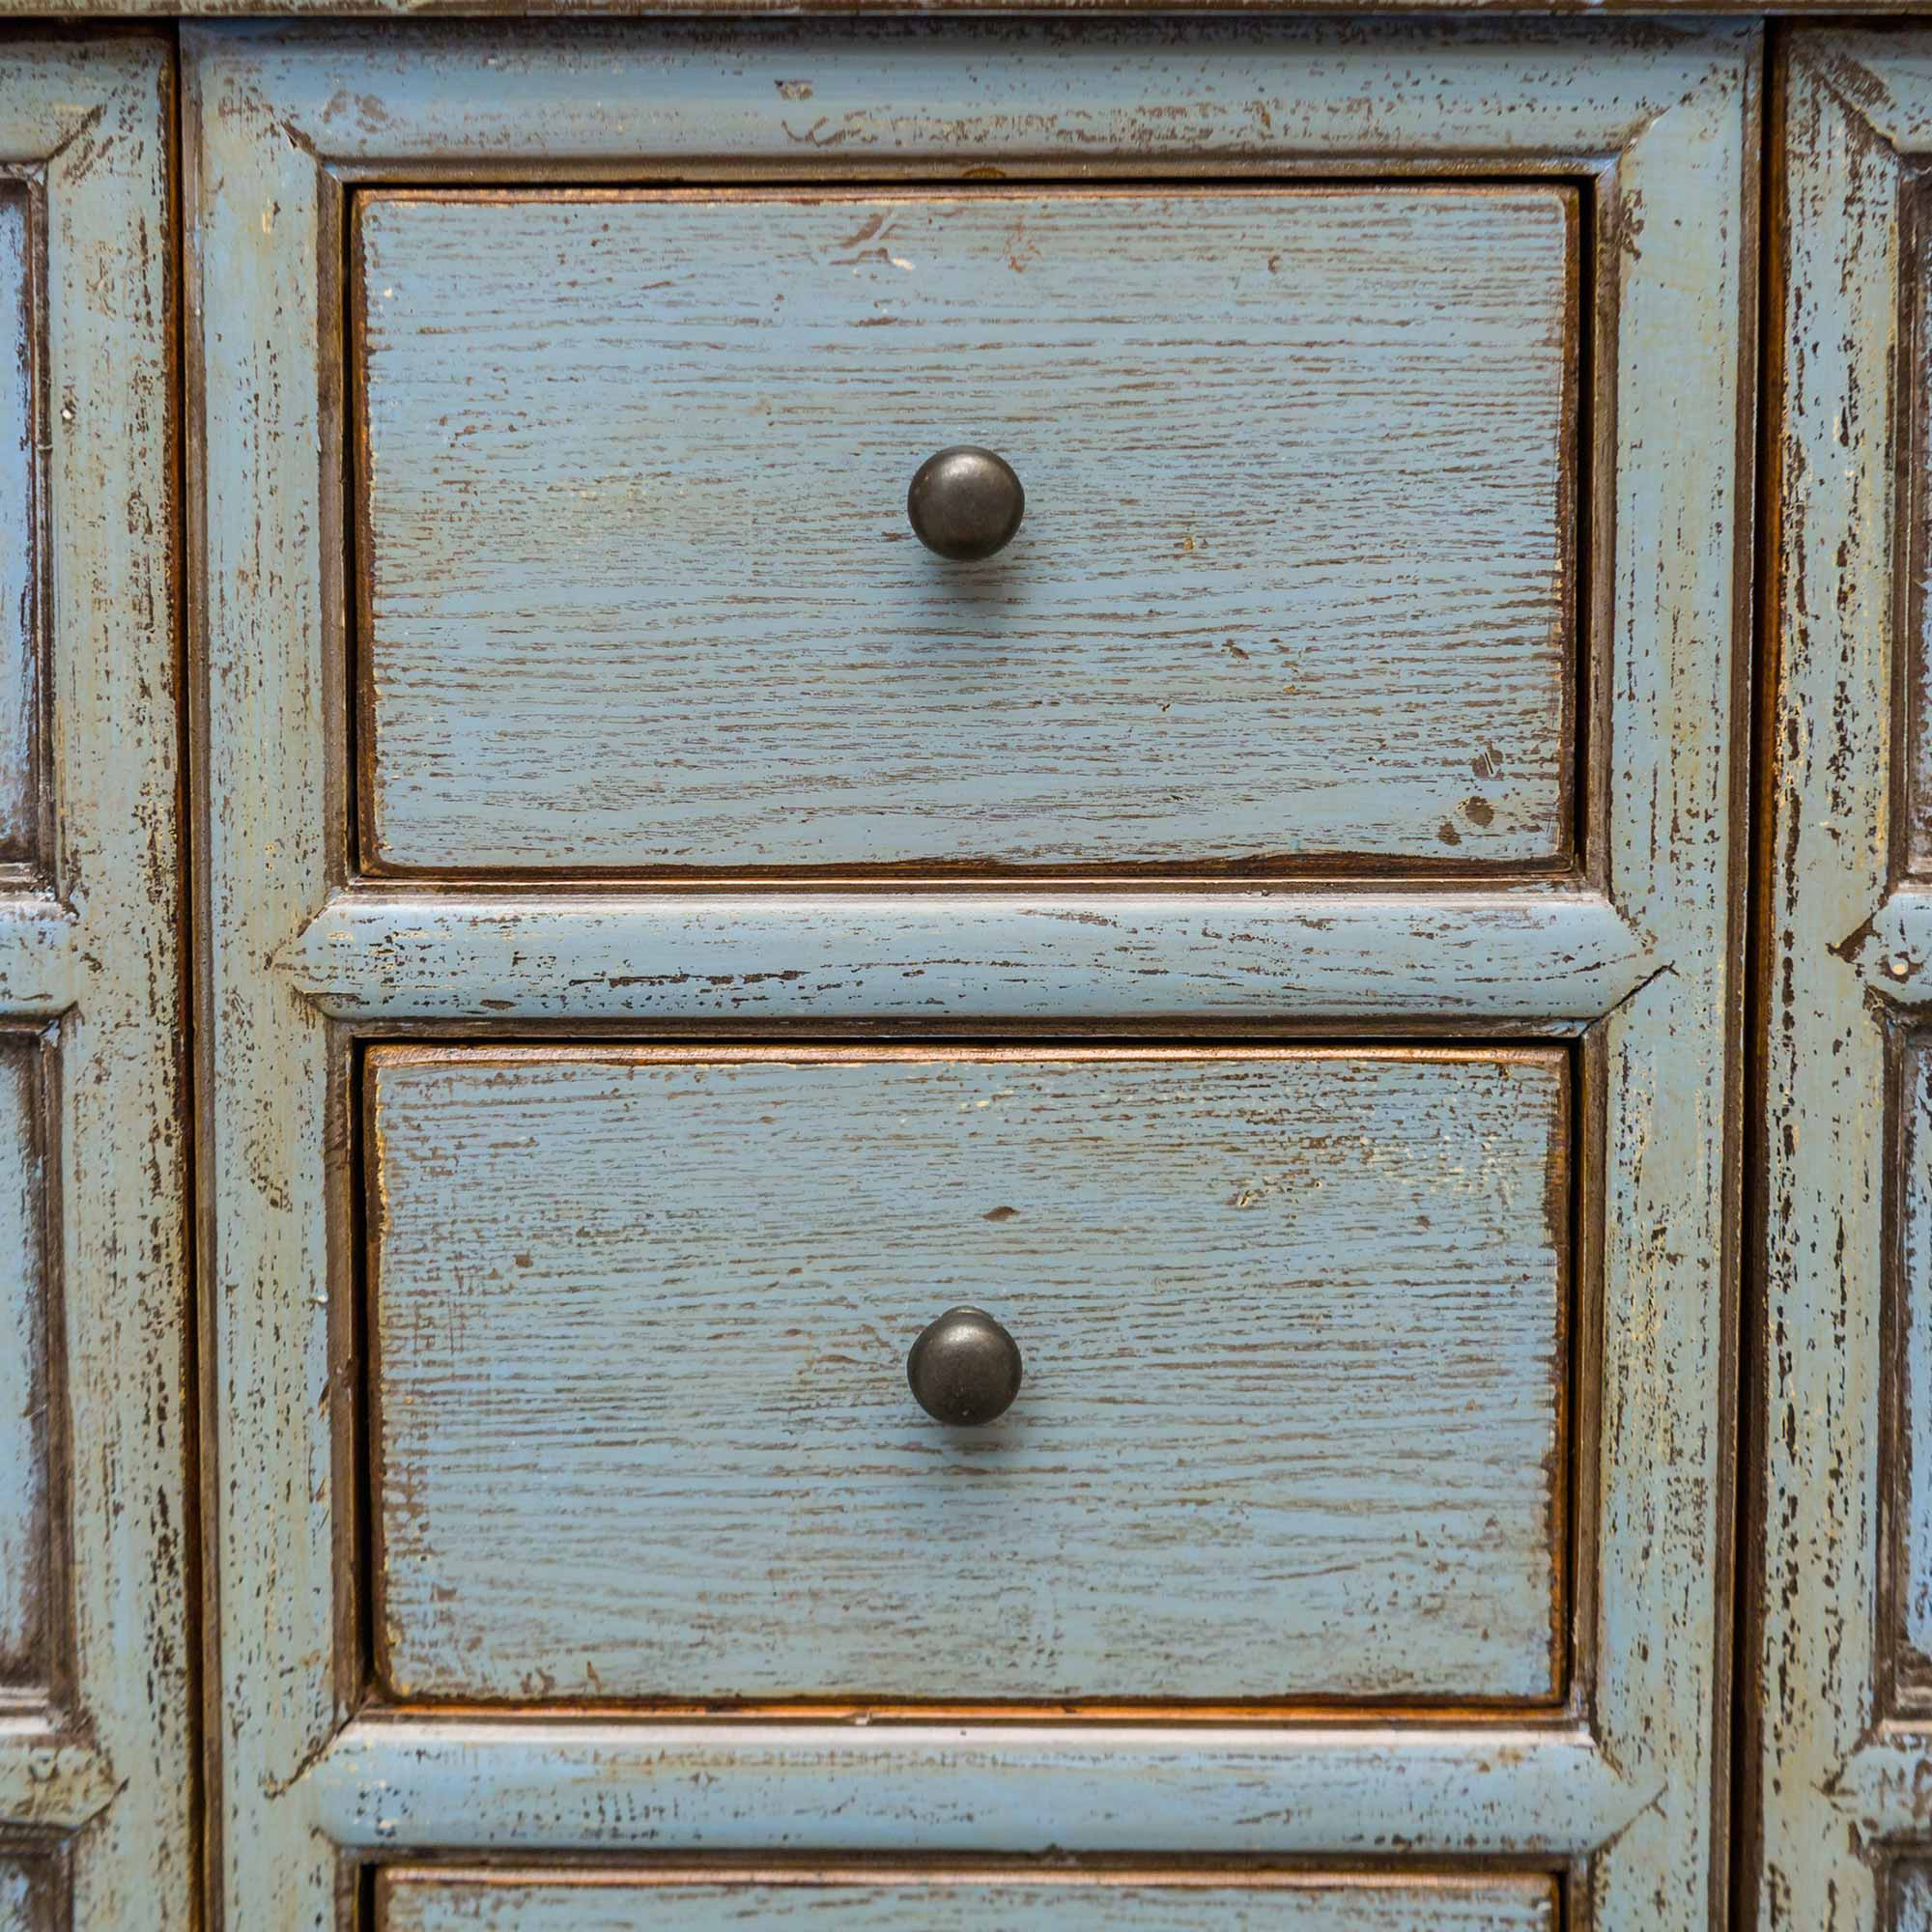 Alan Rustic Lodge 3-Drawer 4-Door Distressed Light Blue Sideboard